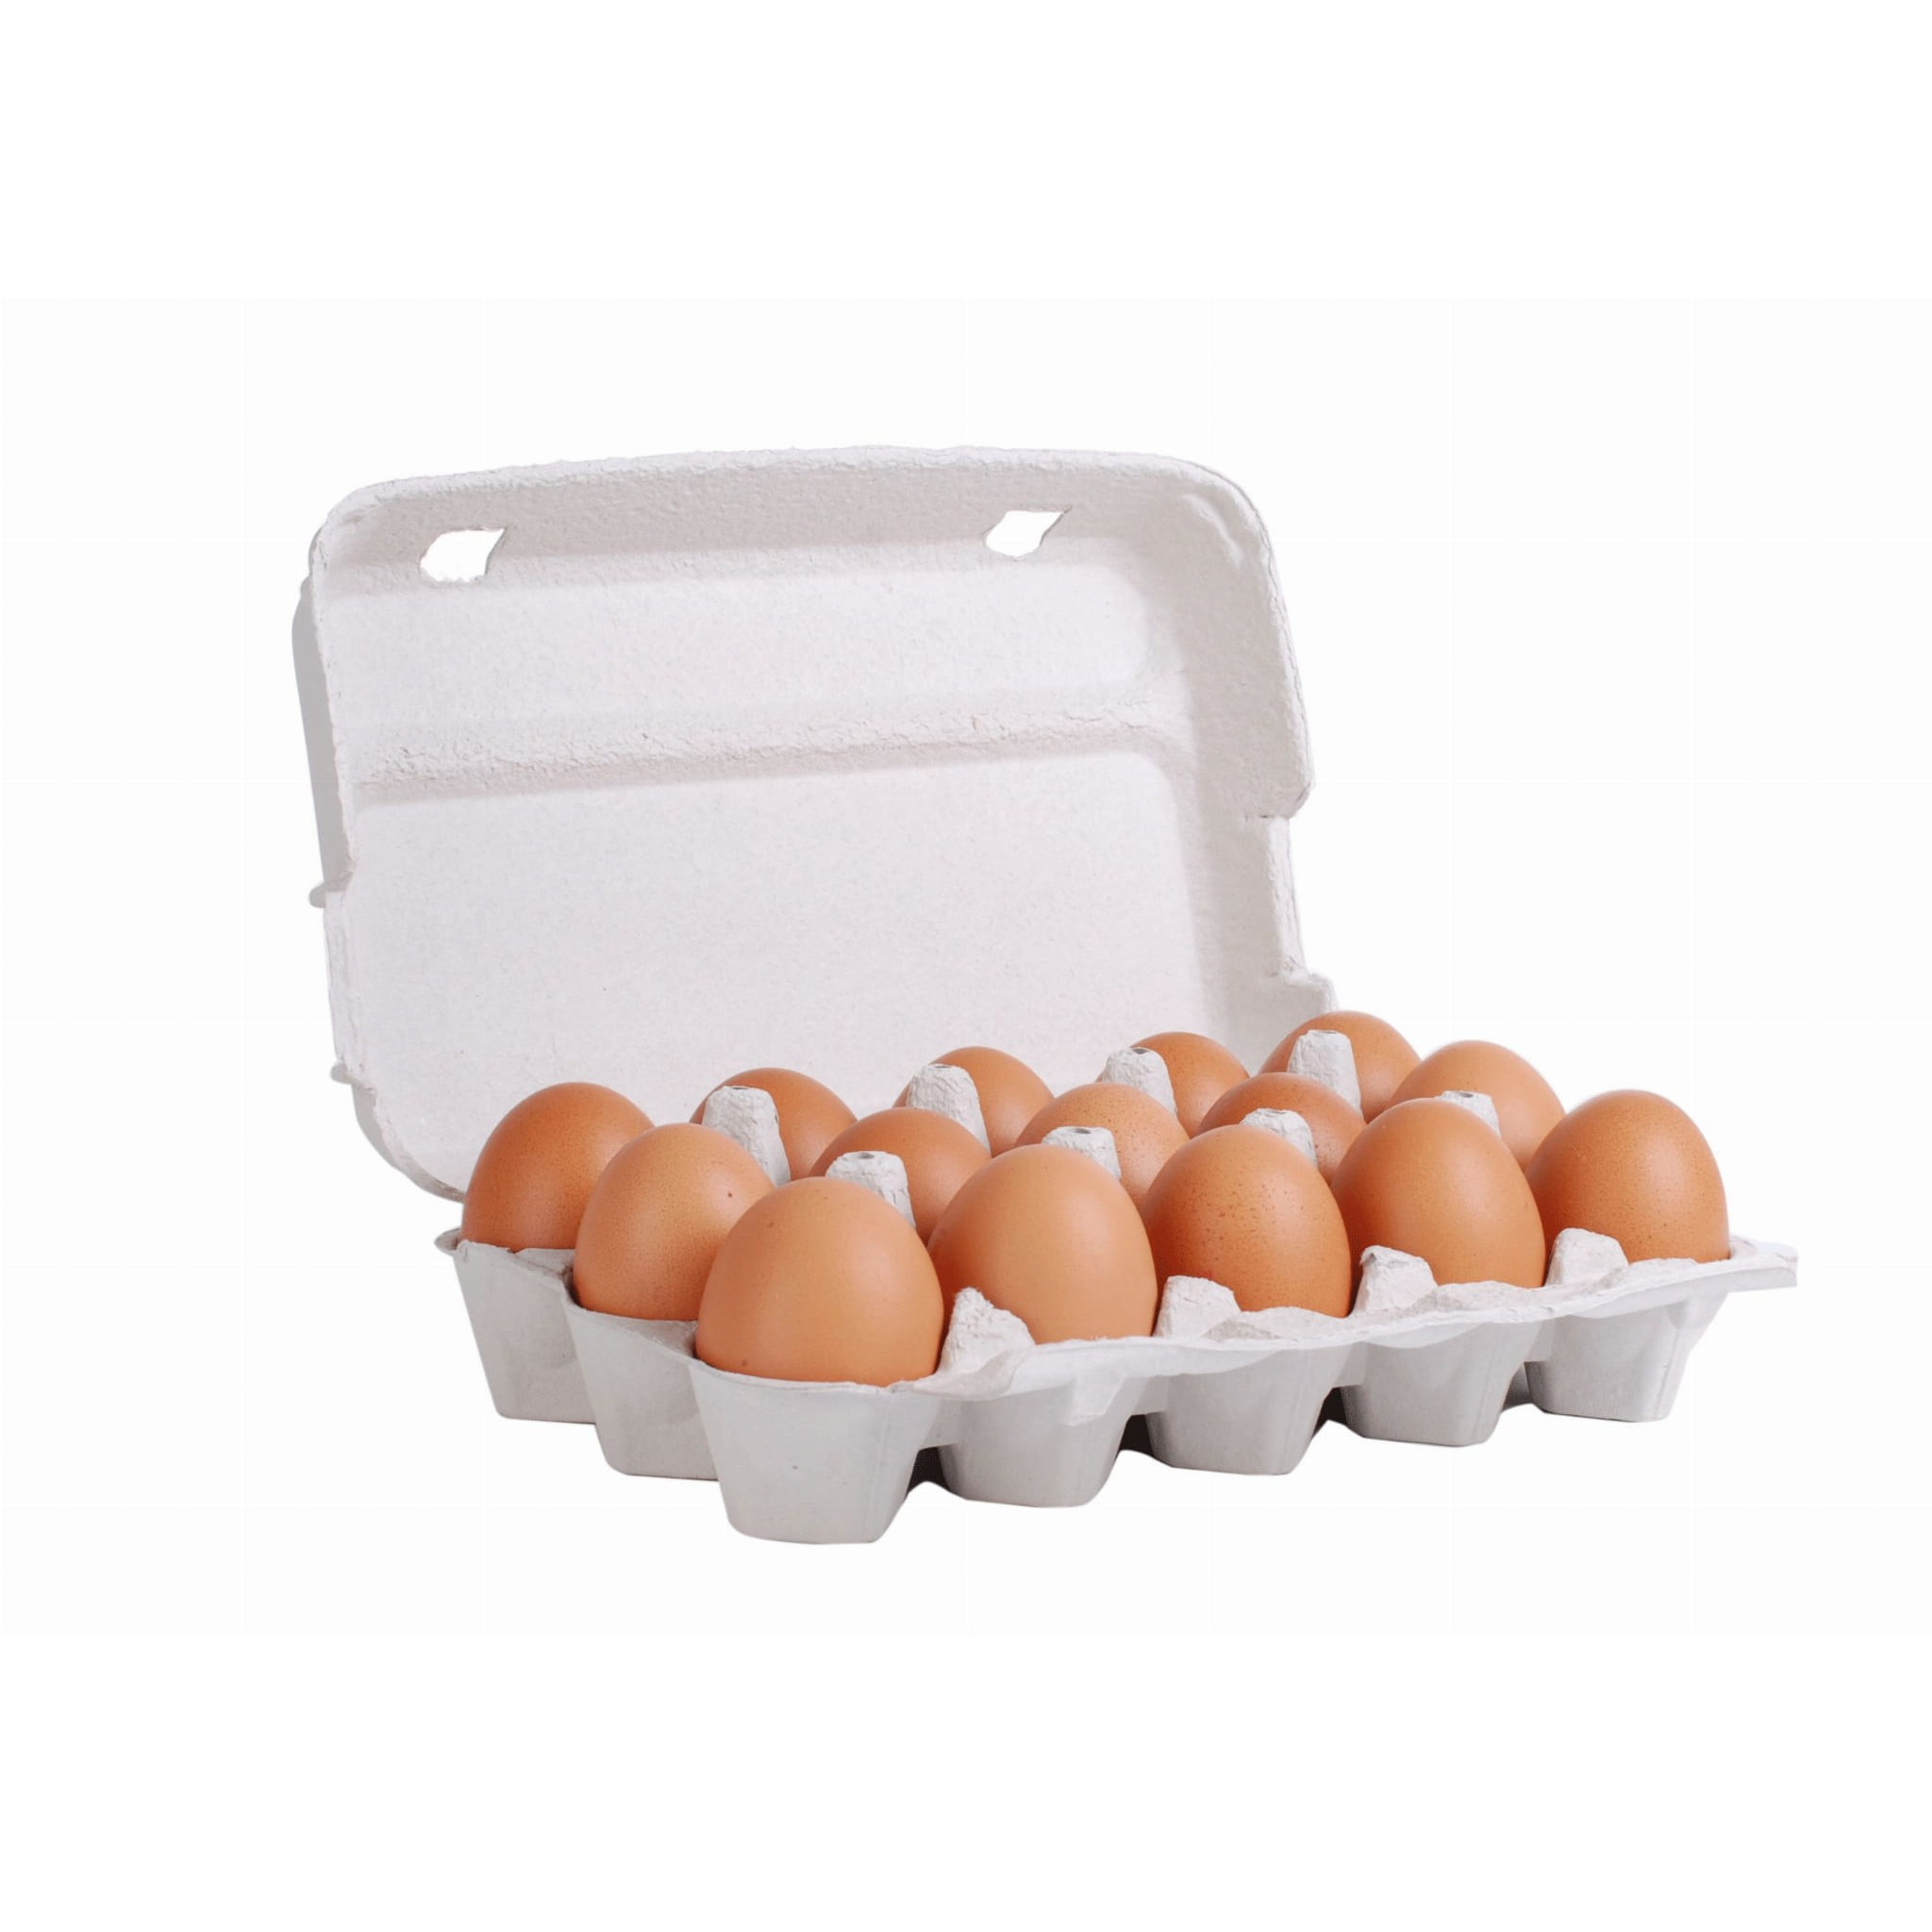 obaly na vajcia na 15ks set 50ks 248x152x69mm šedé megamix.sk